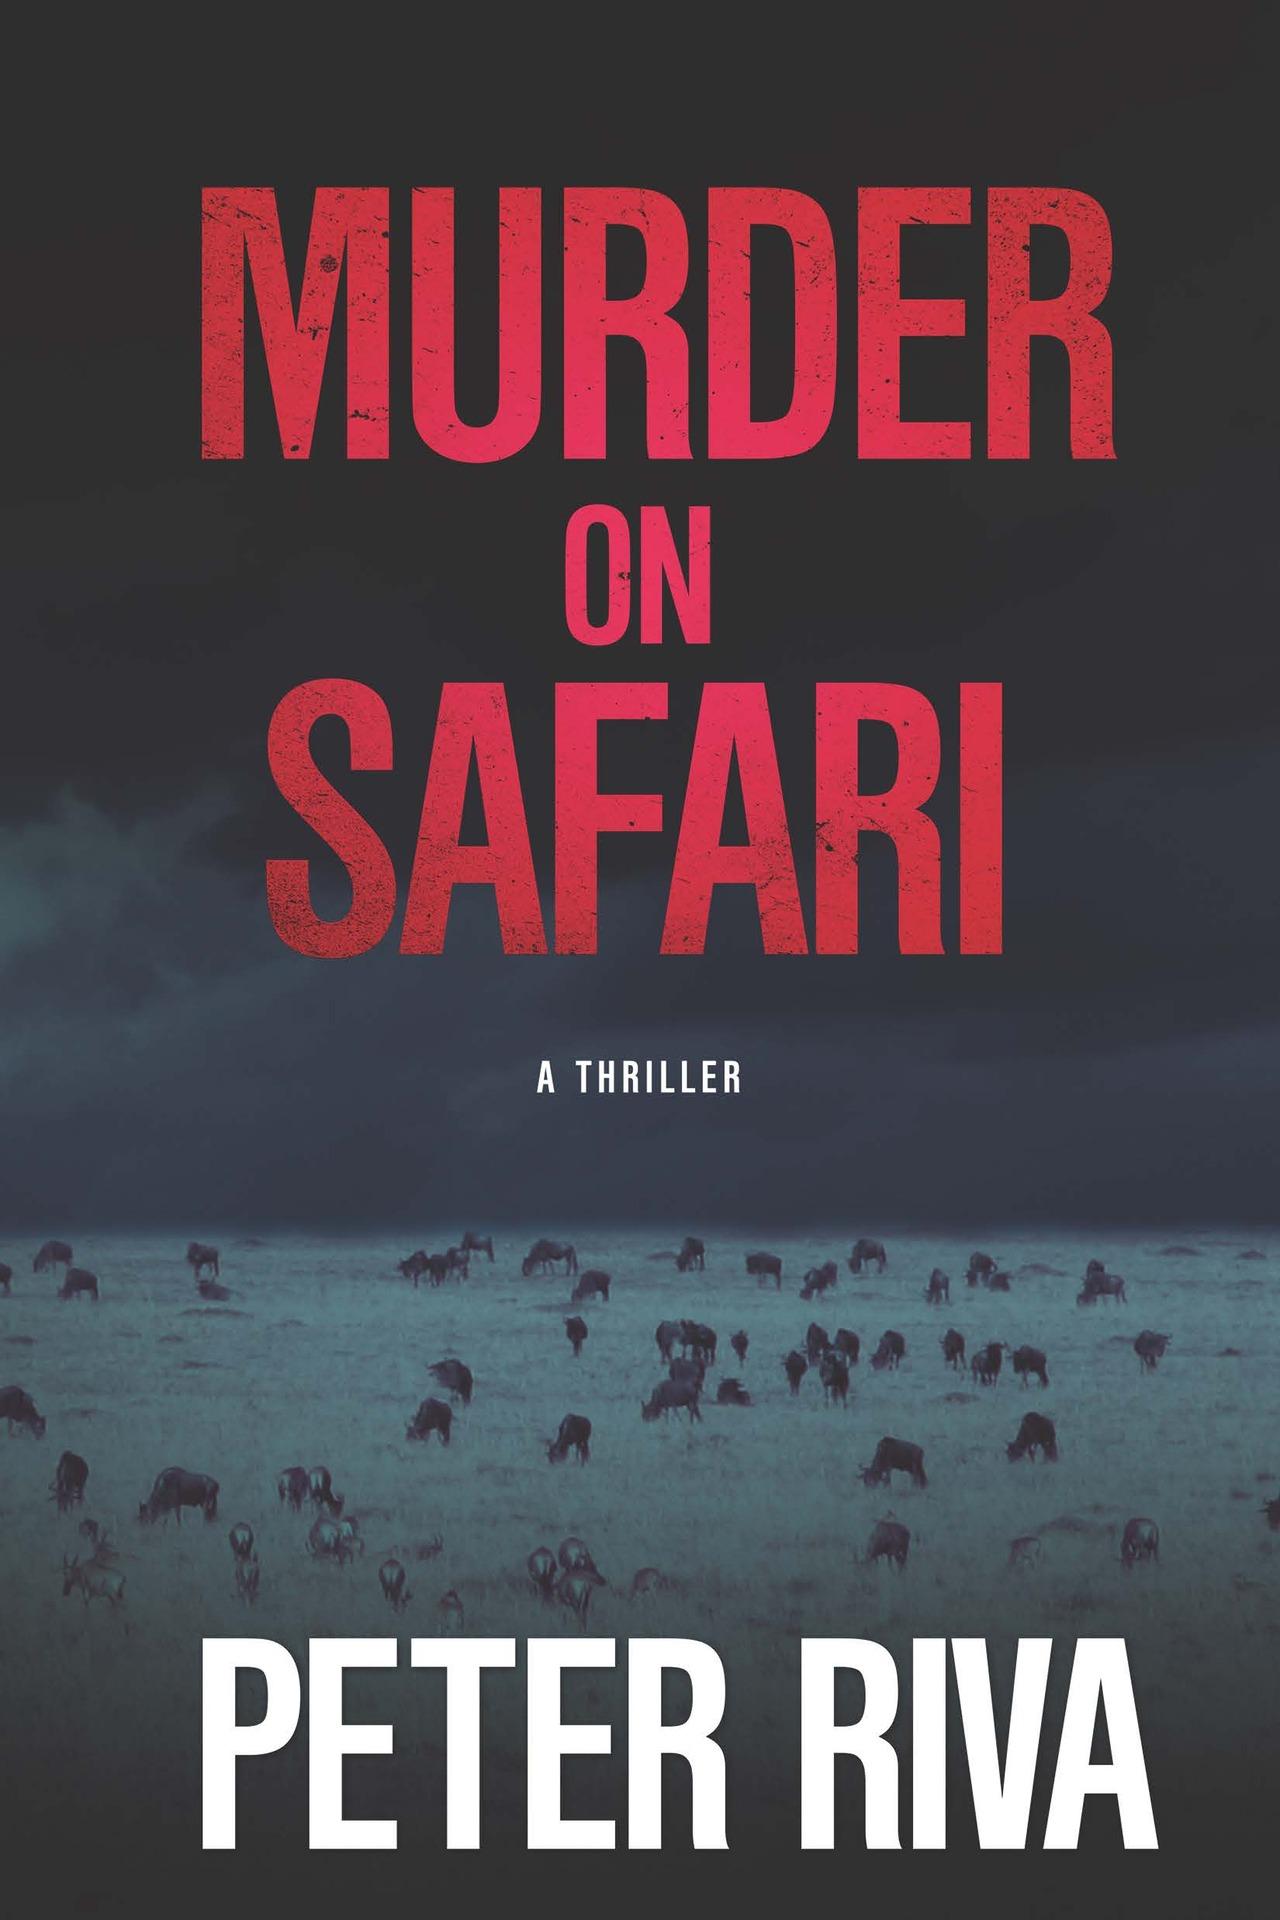 Murderonsafari frontcoveronly pb